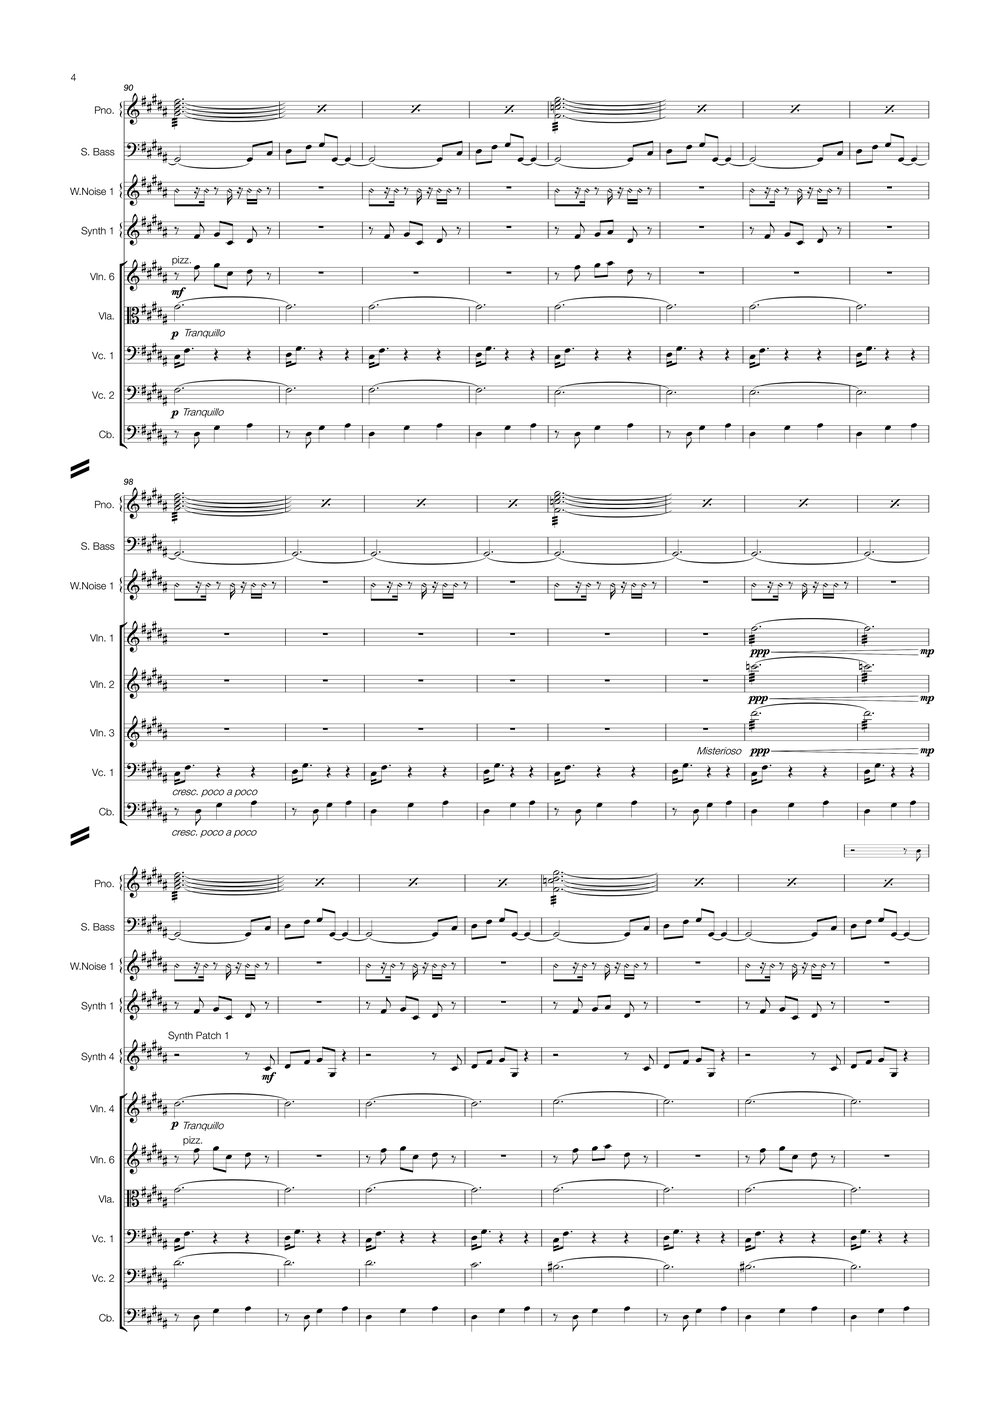 Elliptically Elliptical Score Page 6.jpg